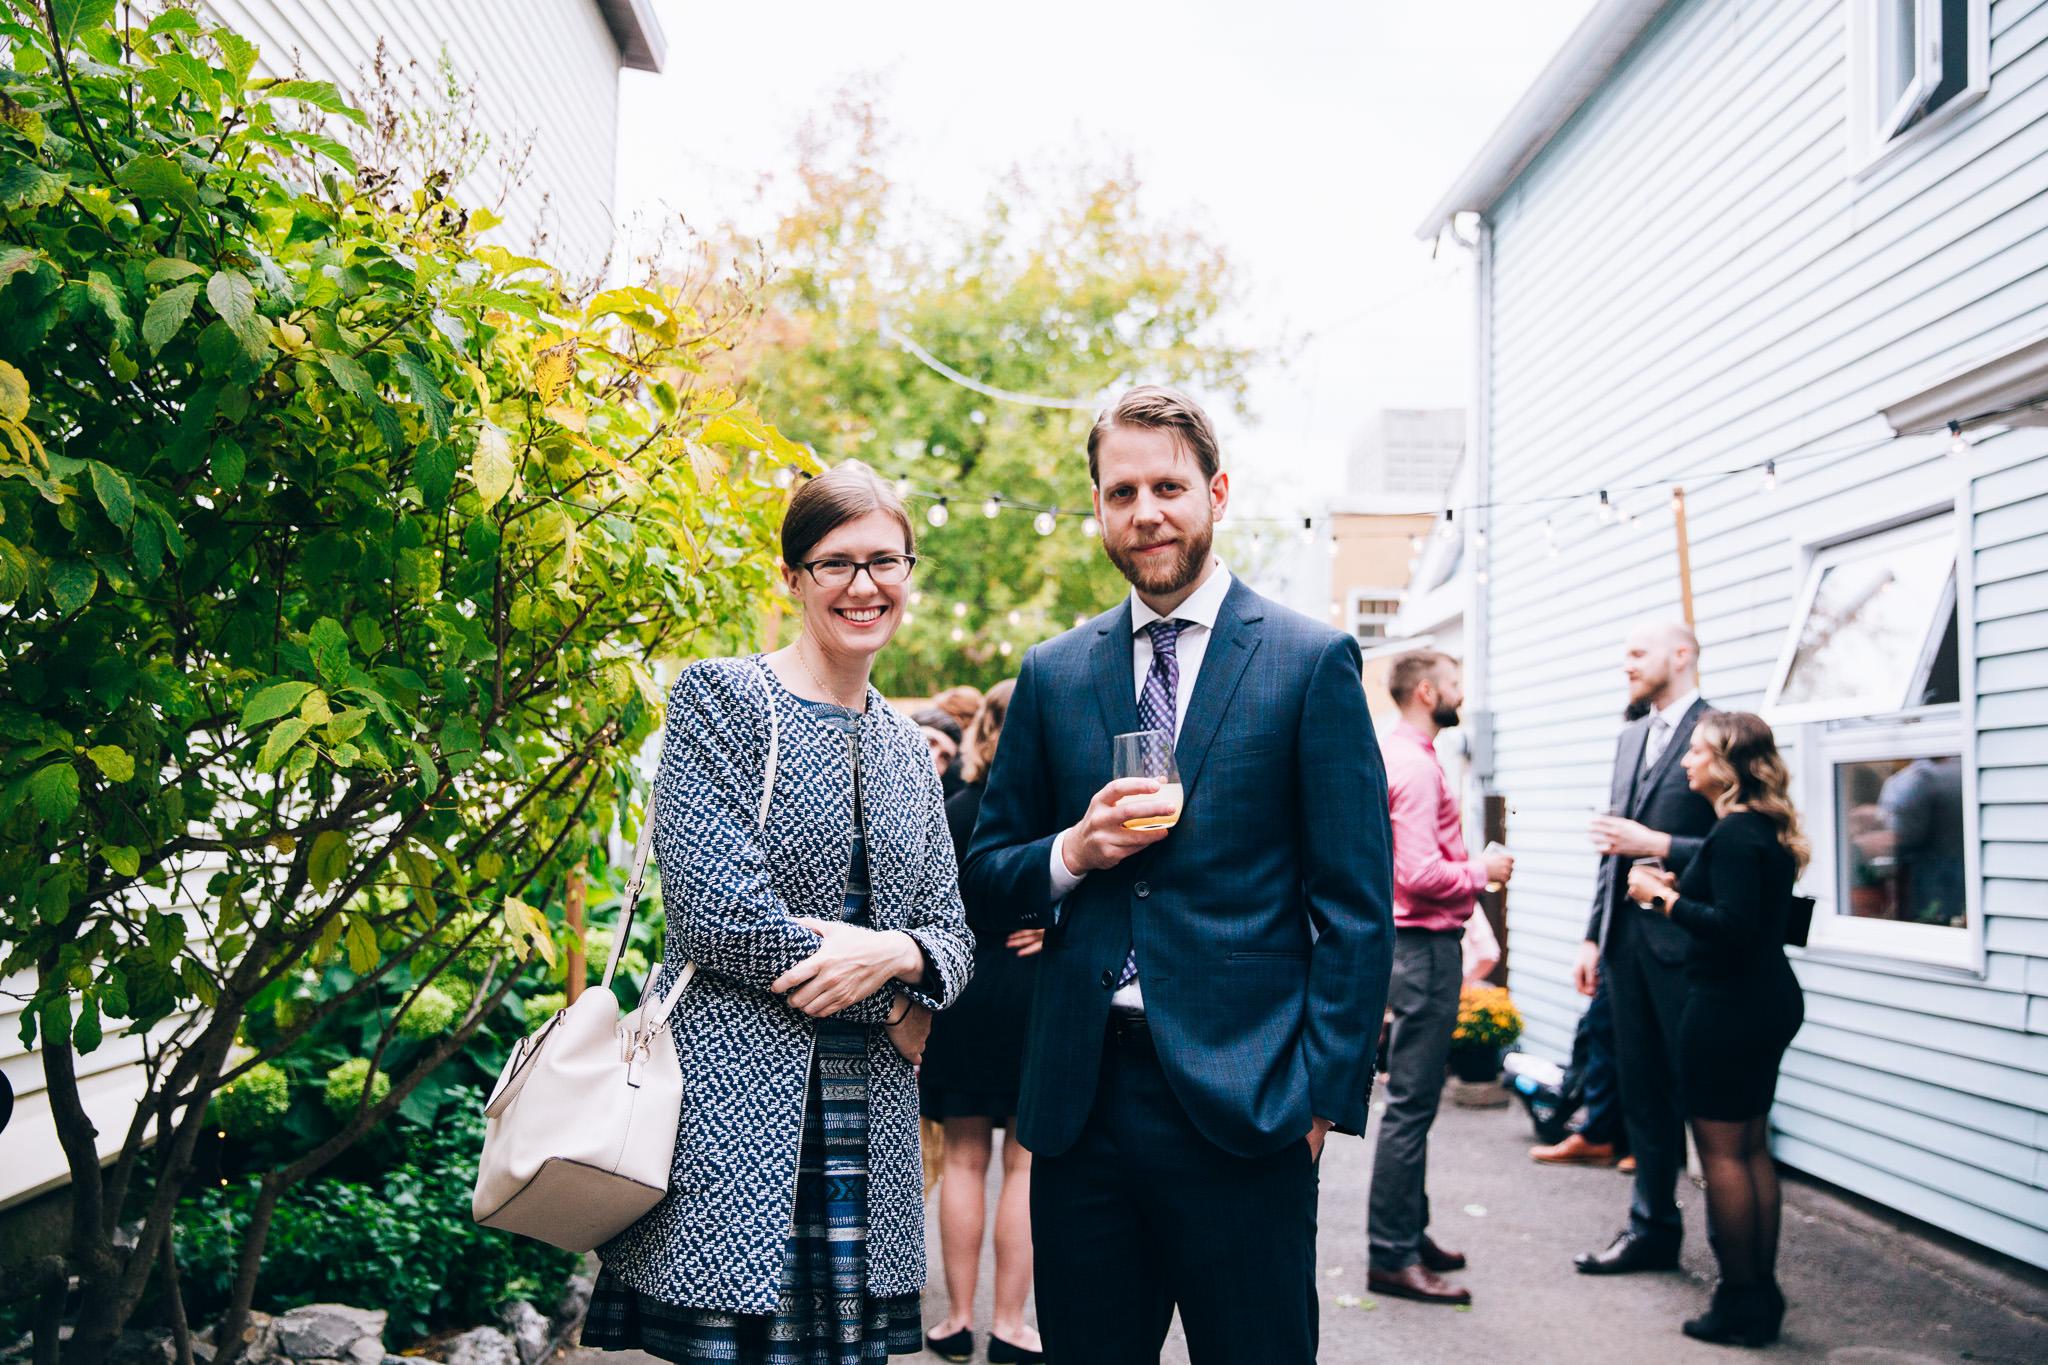 051_Canada-documentary-wedding-photograp